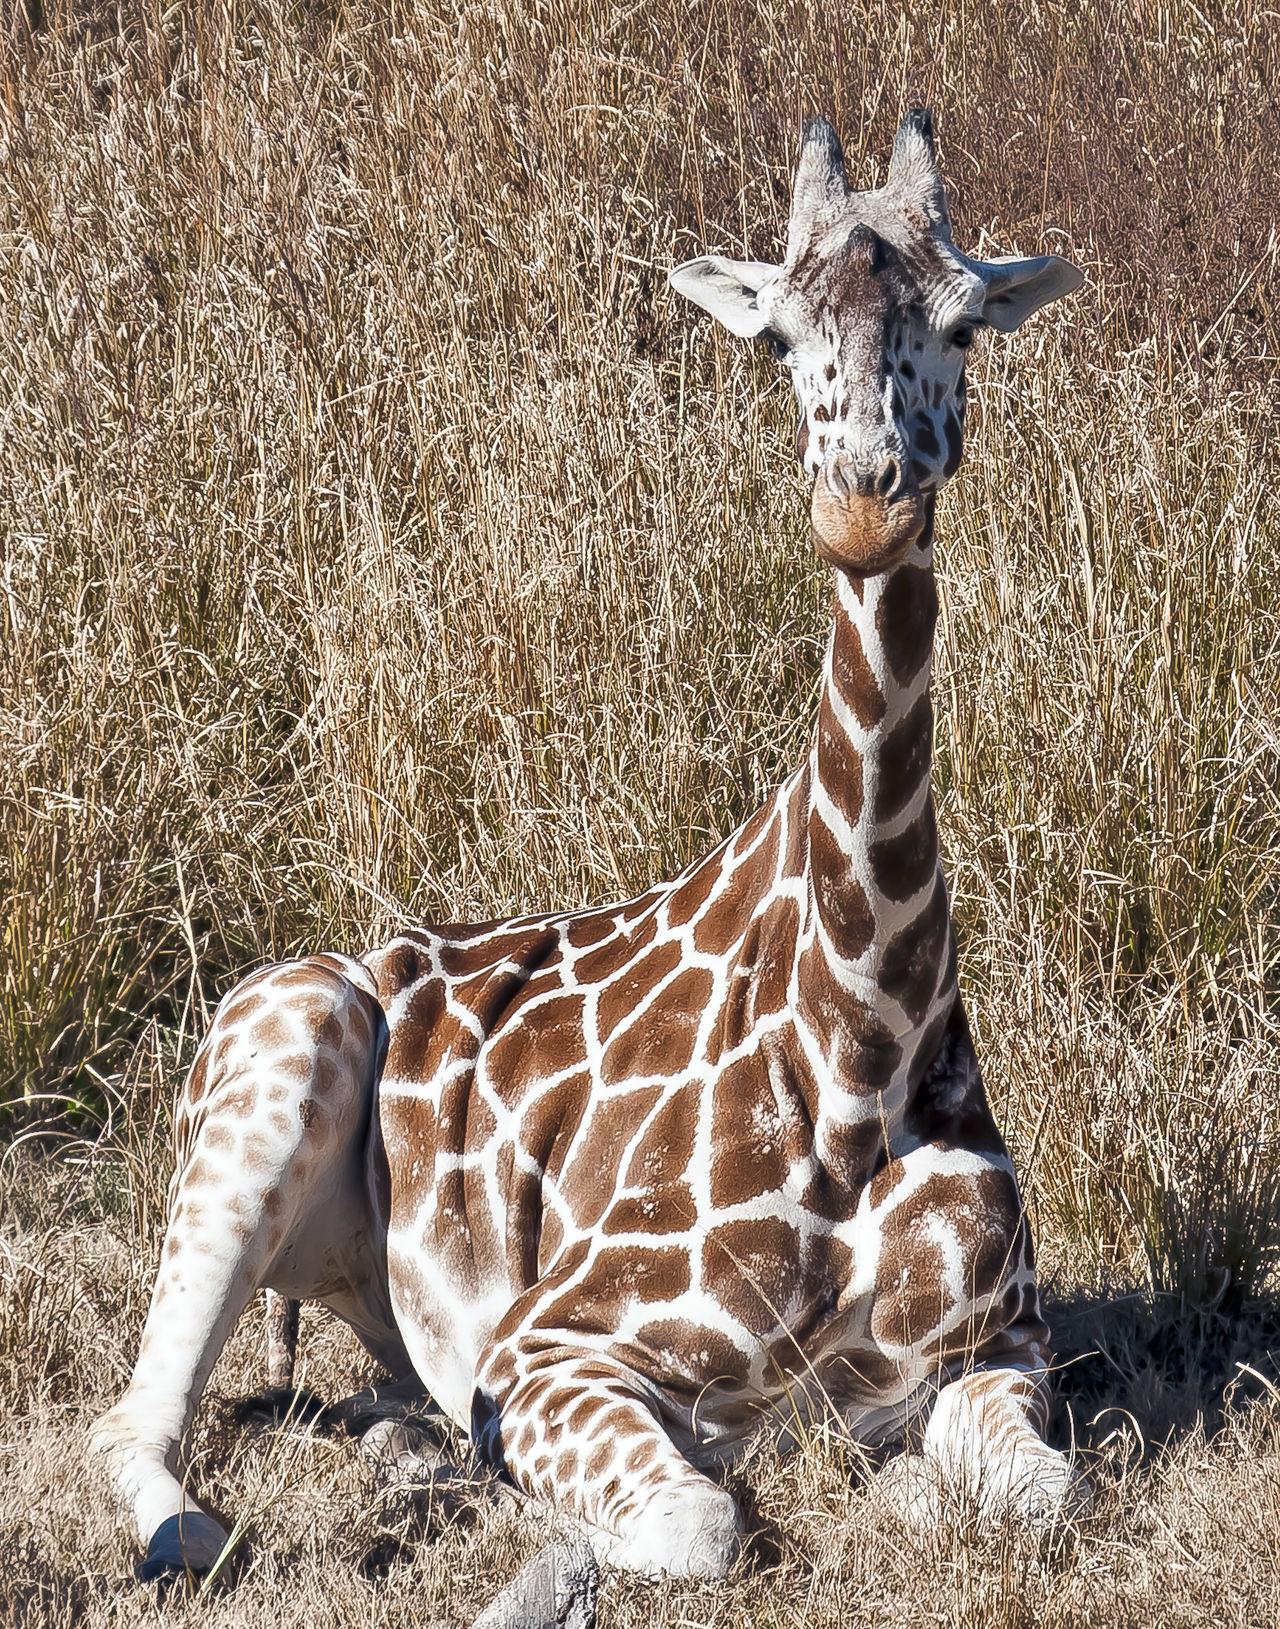 Animal Markings Animal Themes Animal Wildlife Animals In The Wild Giraffe♥ Nature One Animal Outdoors